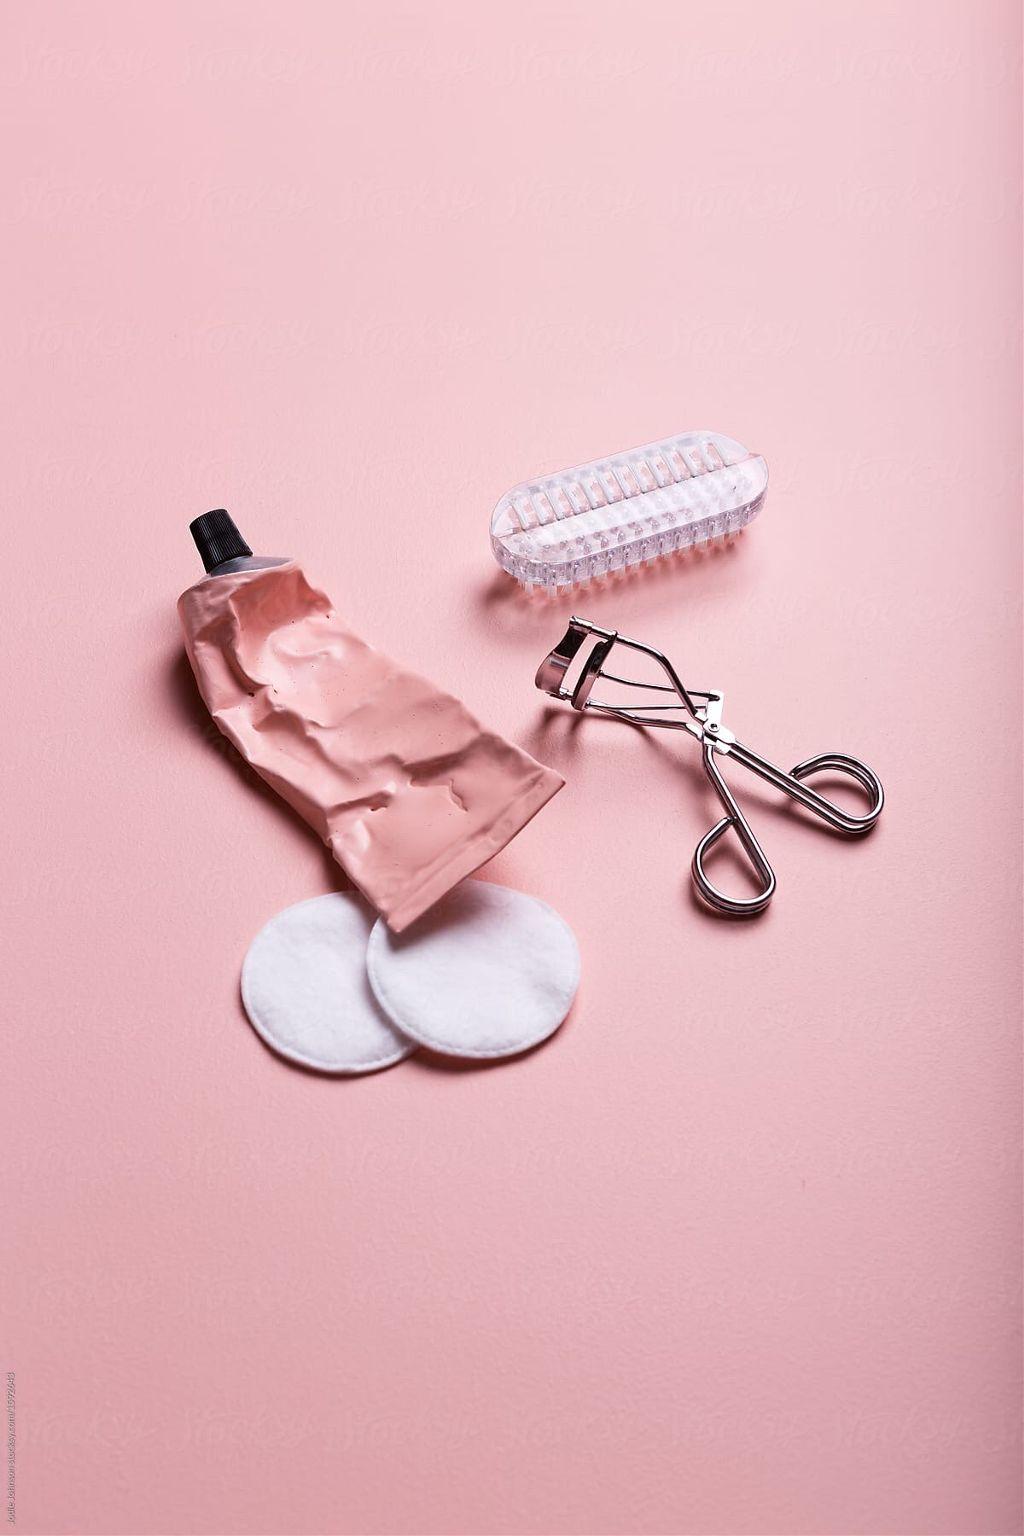 makeup tumblr pink aesthetictumblr aesthetic cute